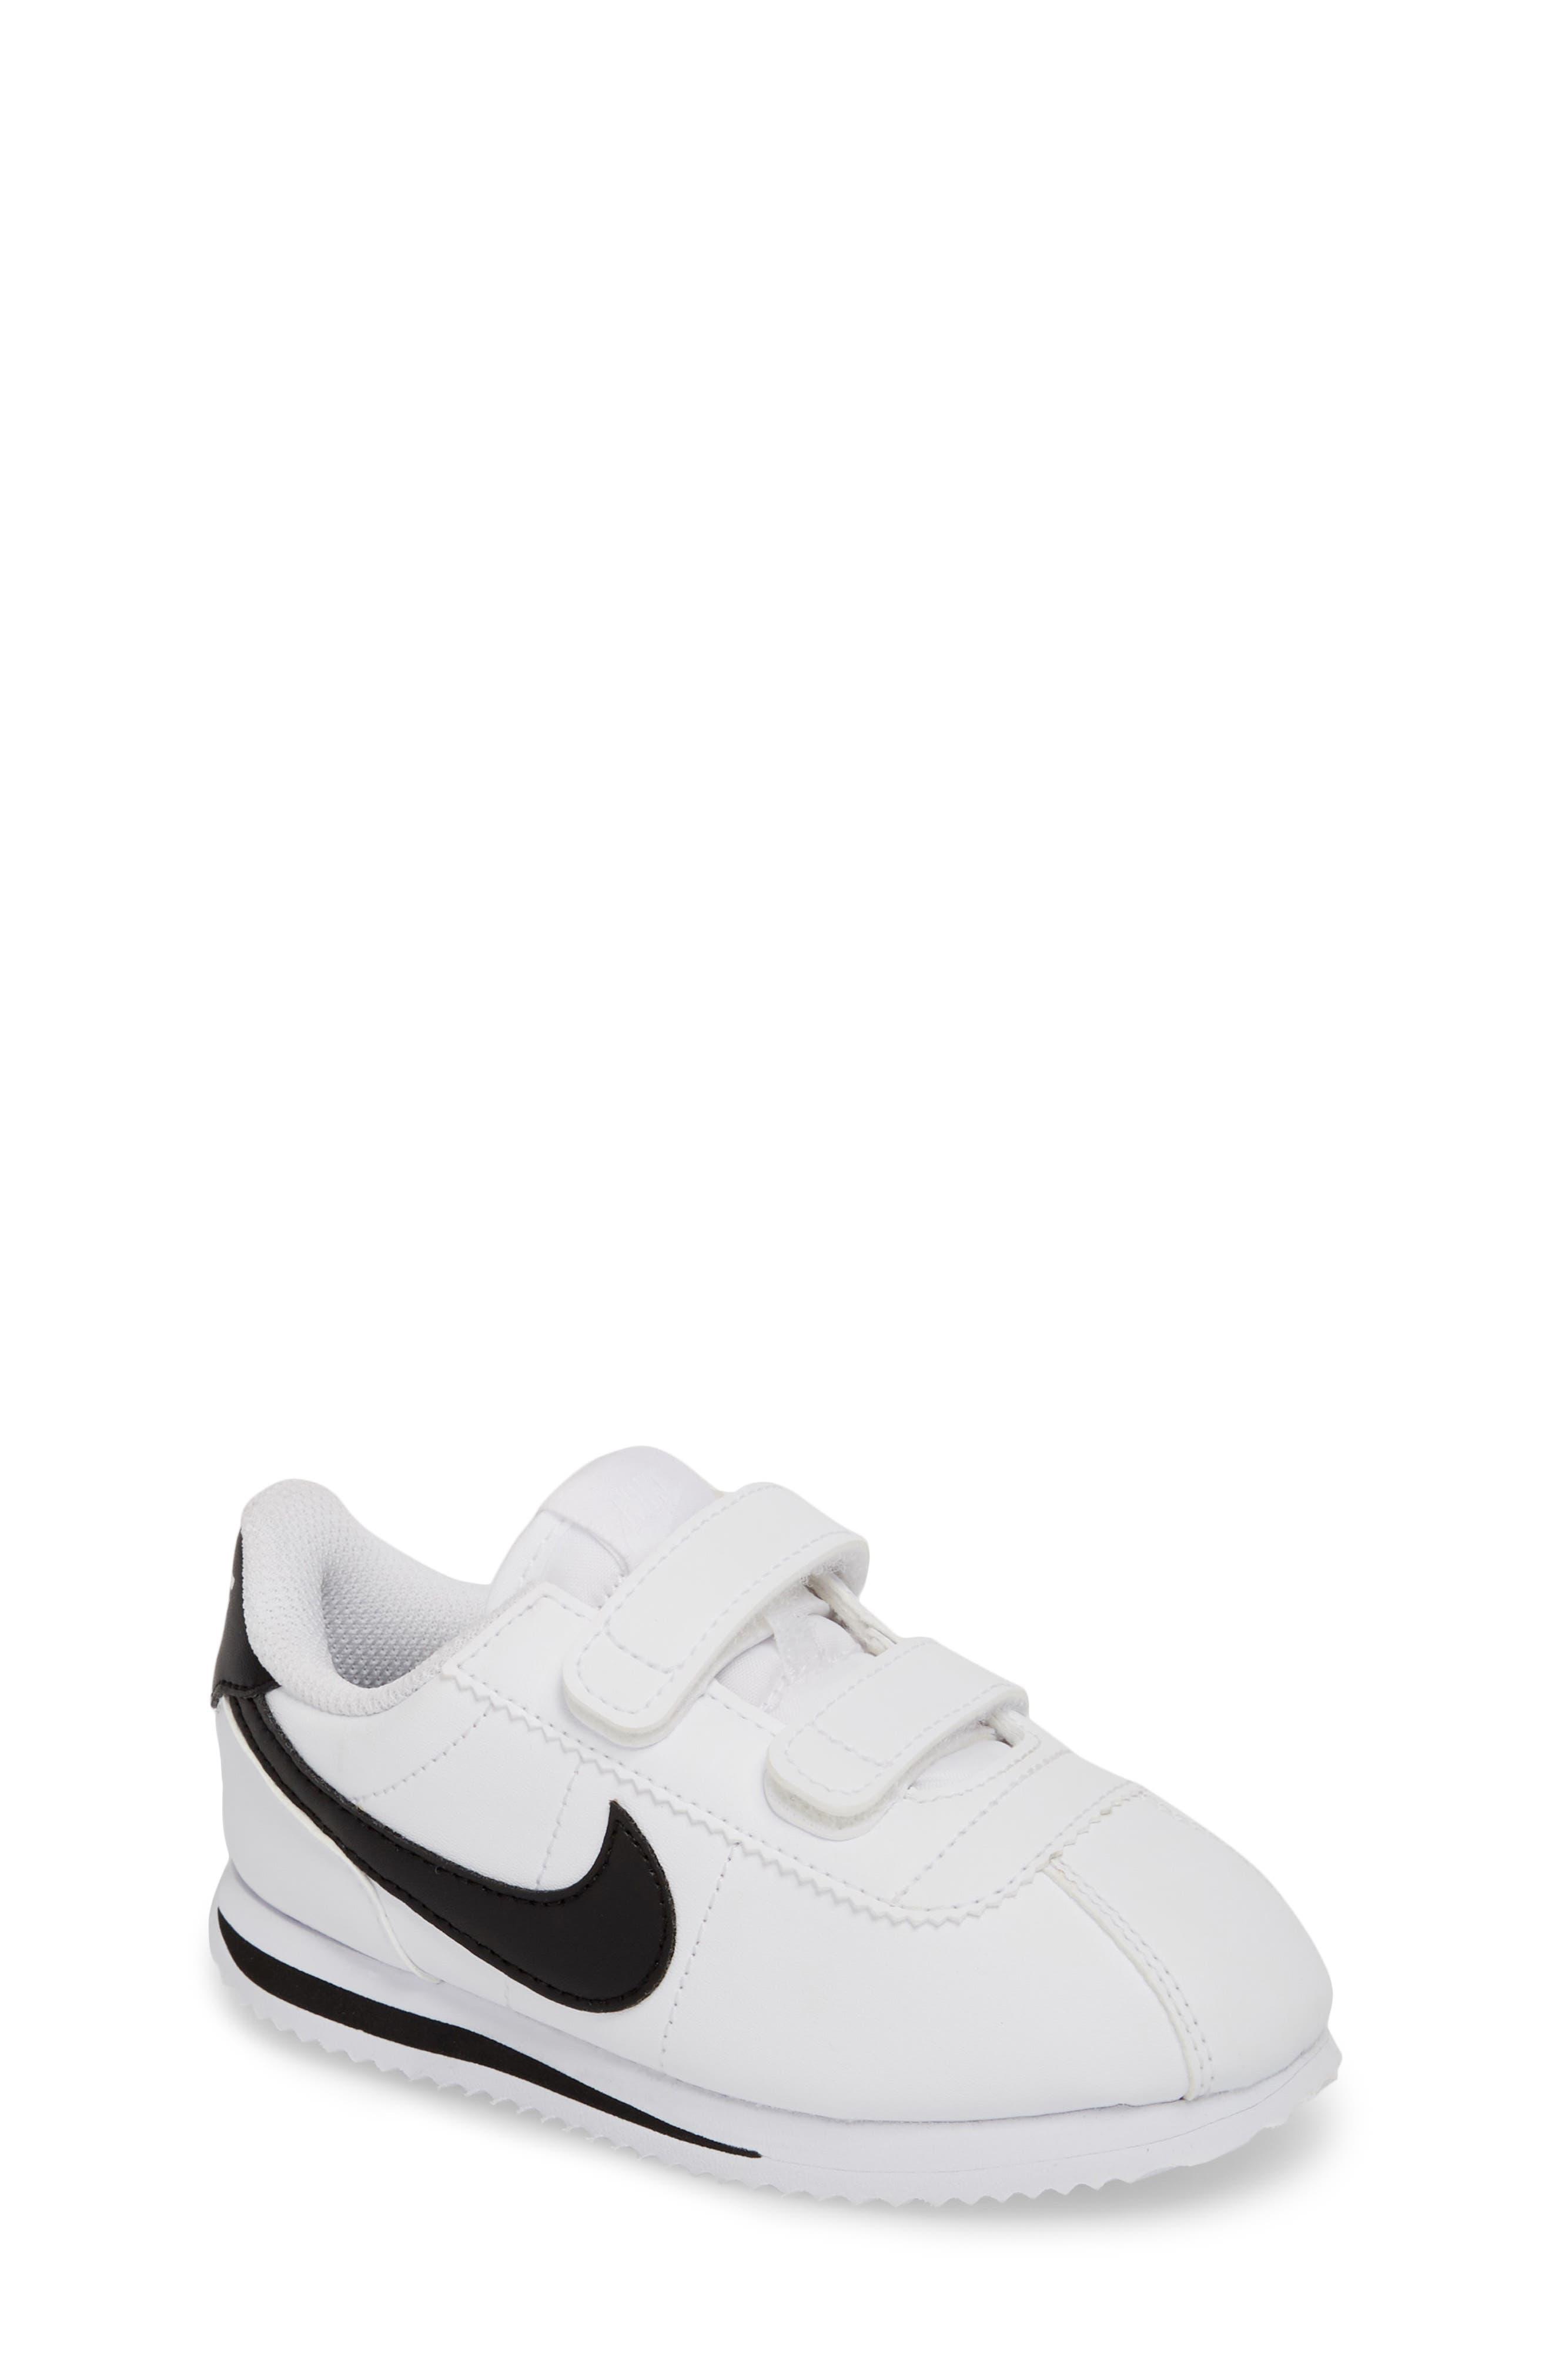 Cortez Basic SL Sneaker,                         Main,                         color, WHITE/ BLACK